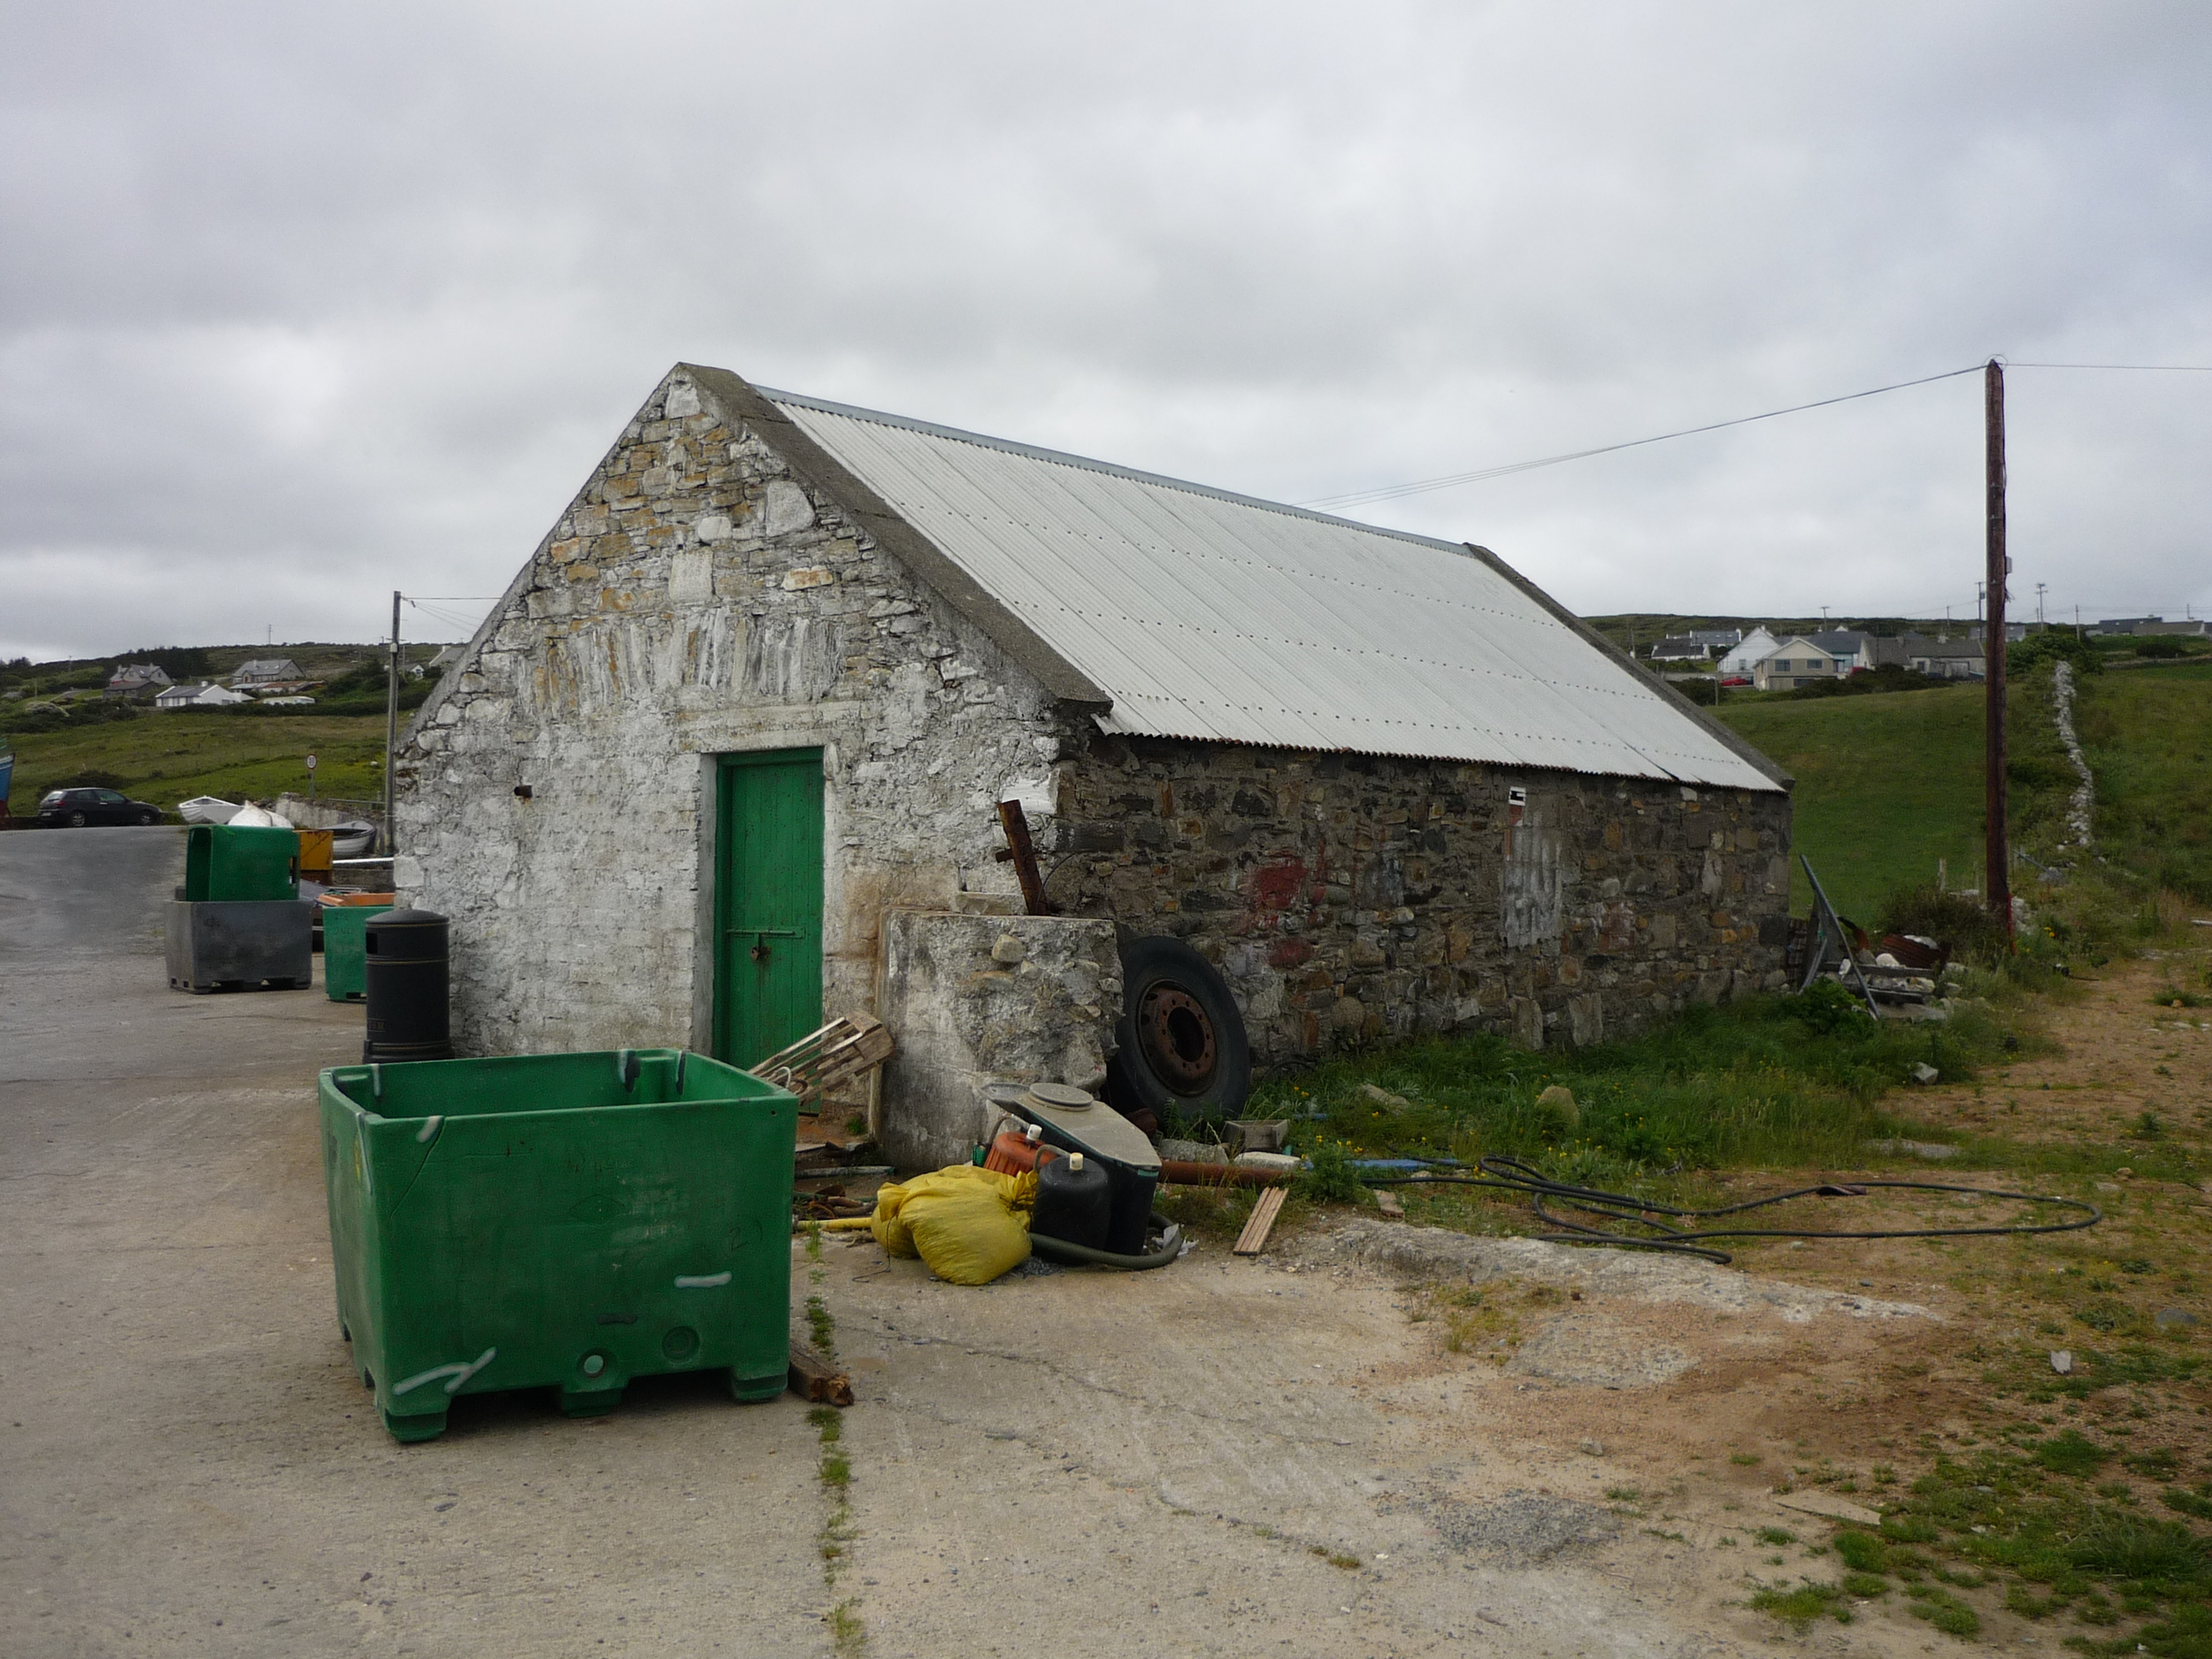 Coastguard Boathouse, Minlaragh, Donegal, Ireland